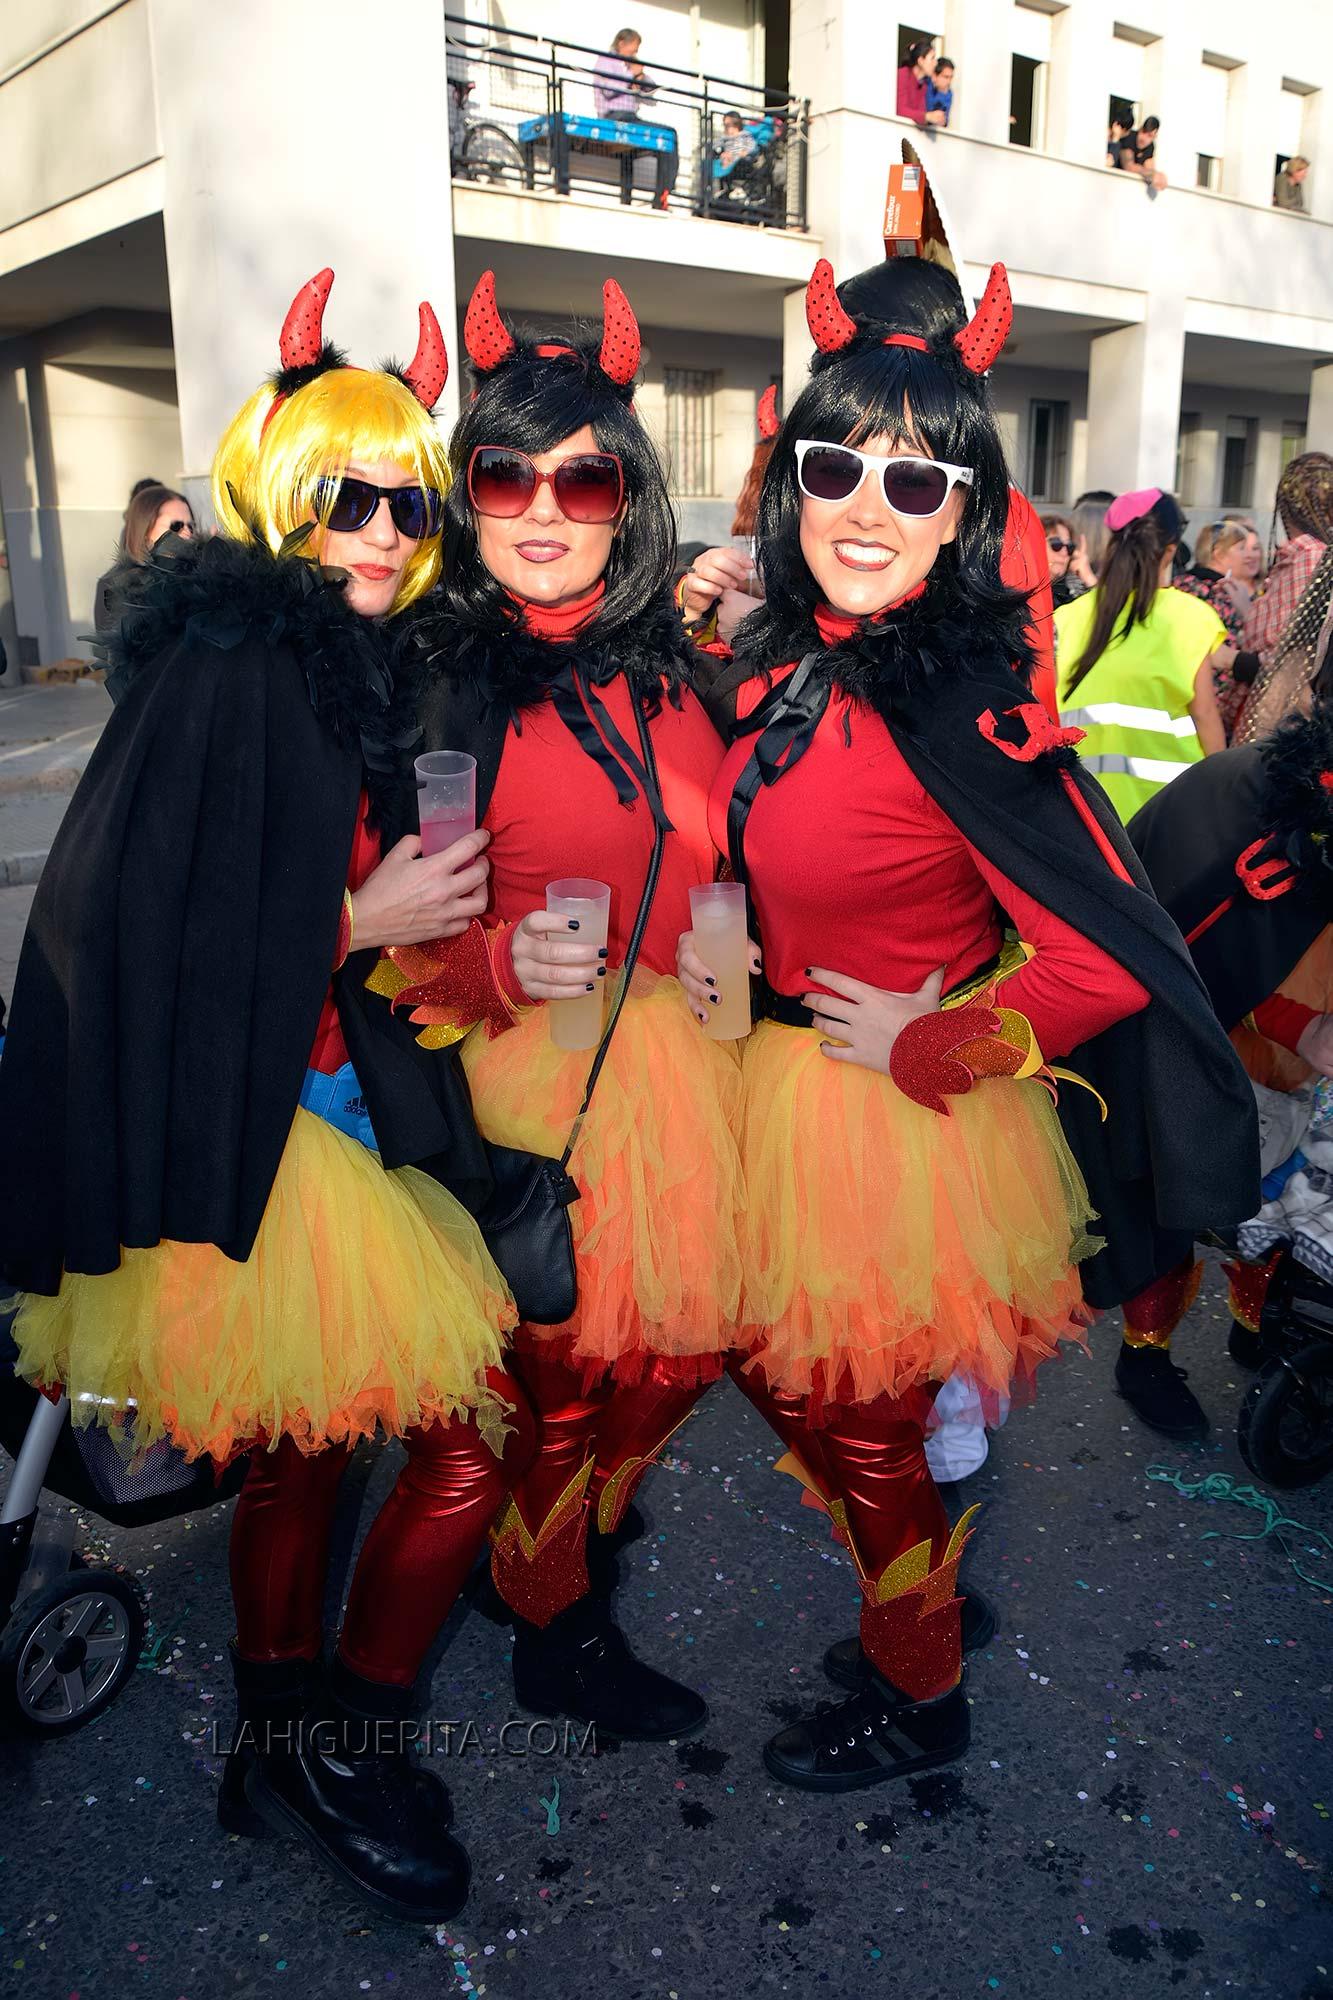 cabalgata carnaval isla cristina _DSC0793